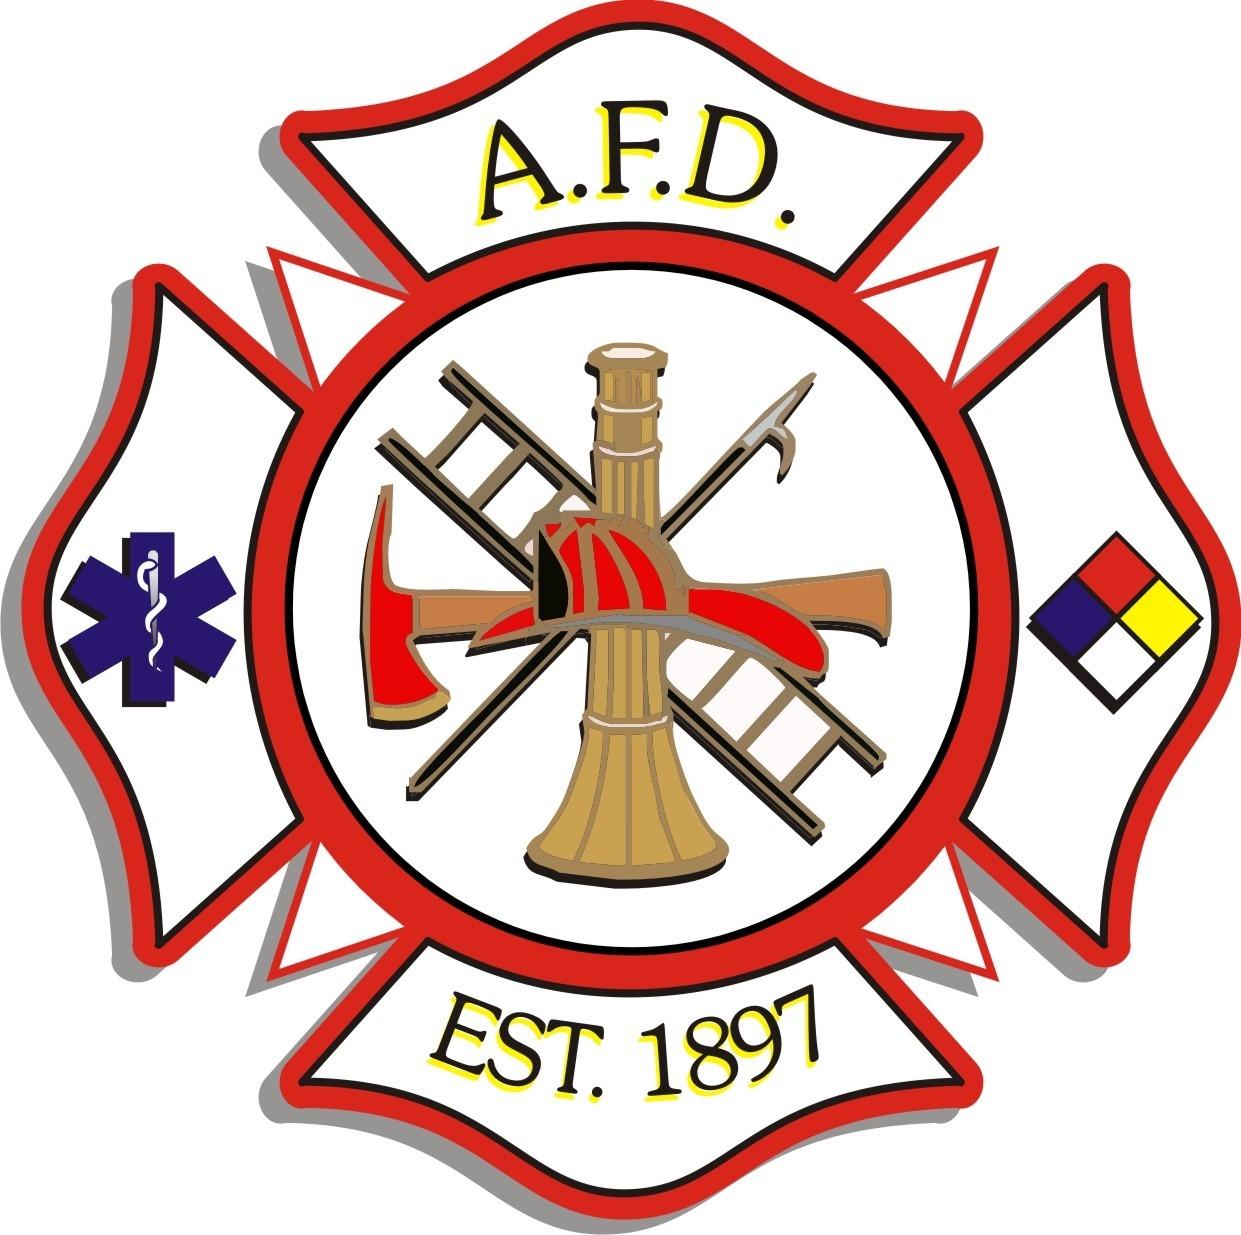 Fire Department Maltese Cross - ClipArt Best